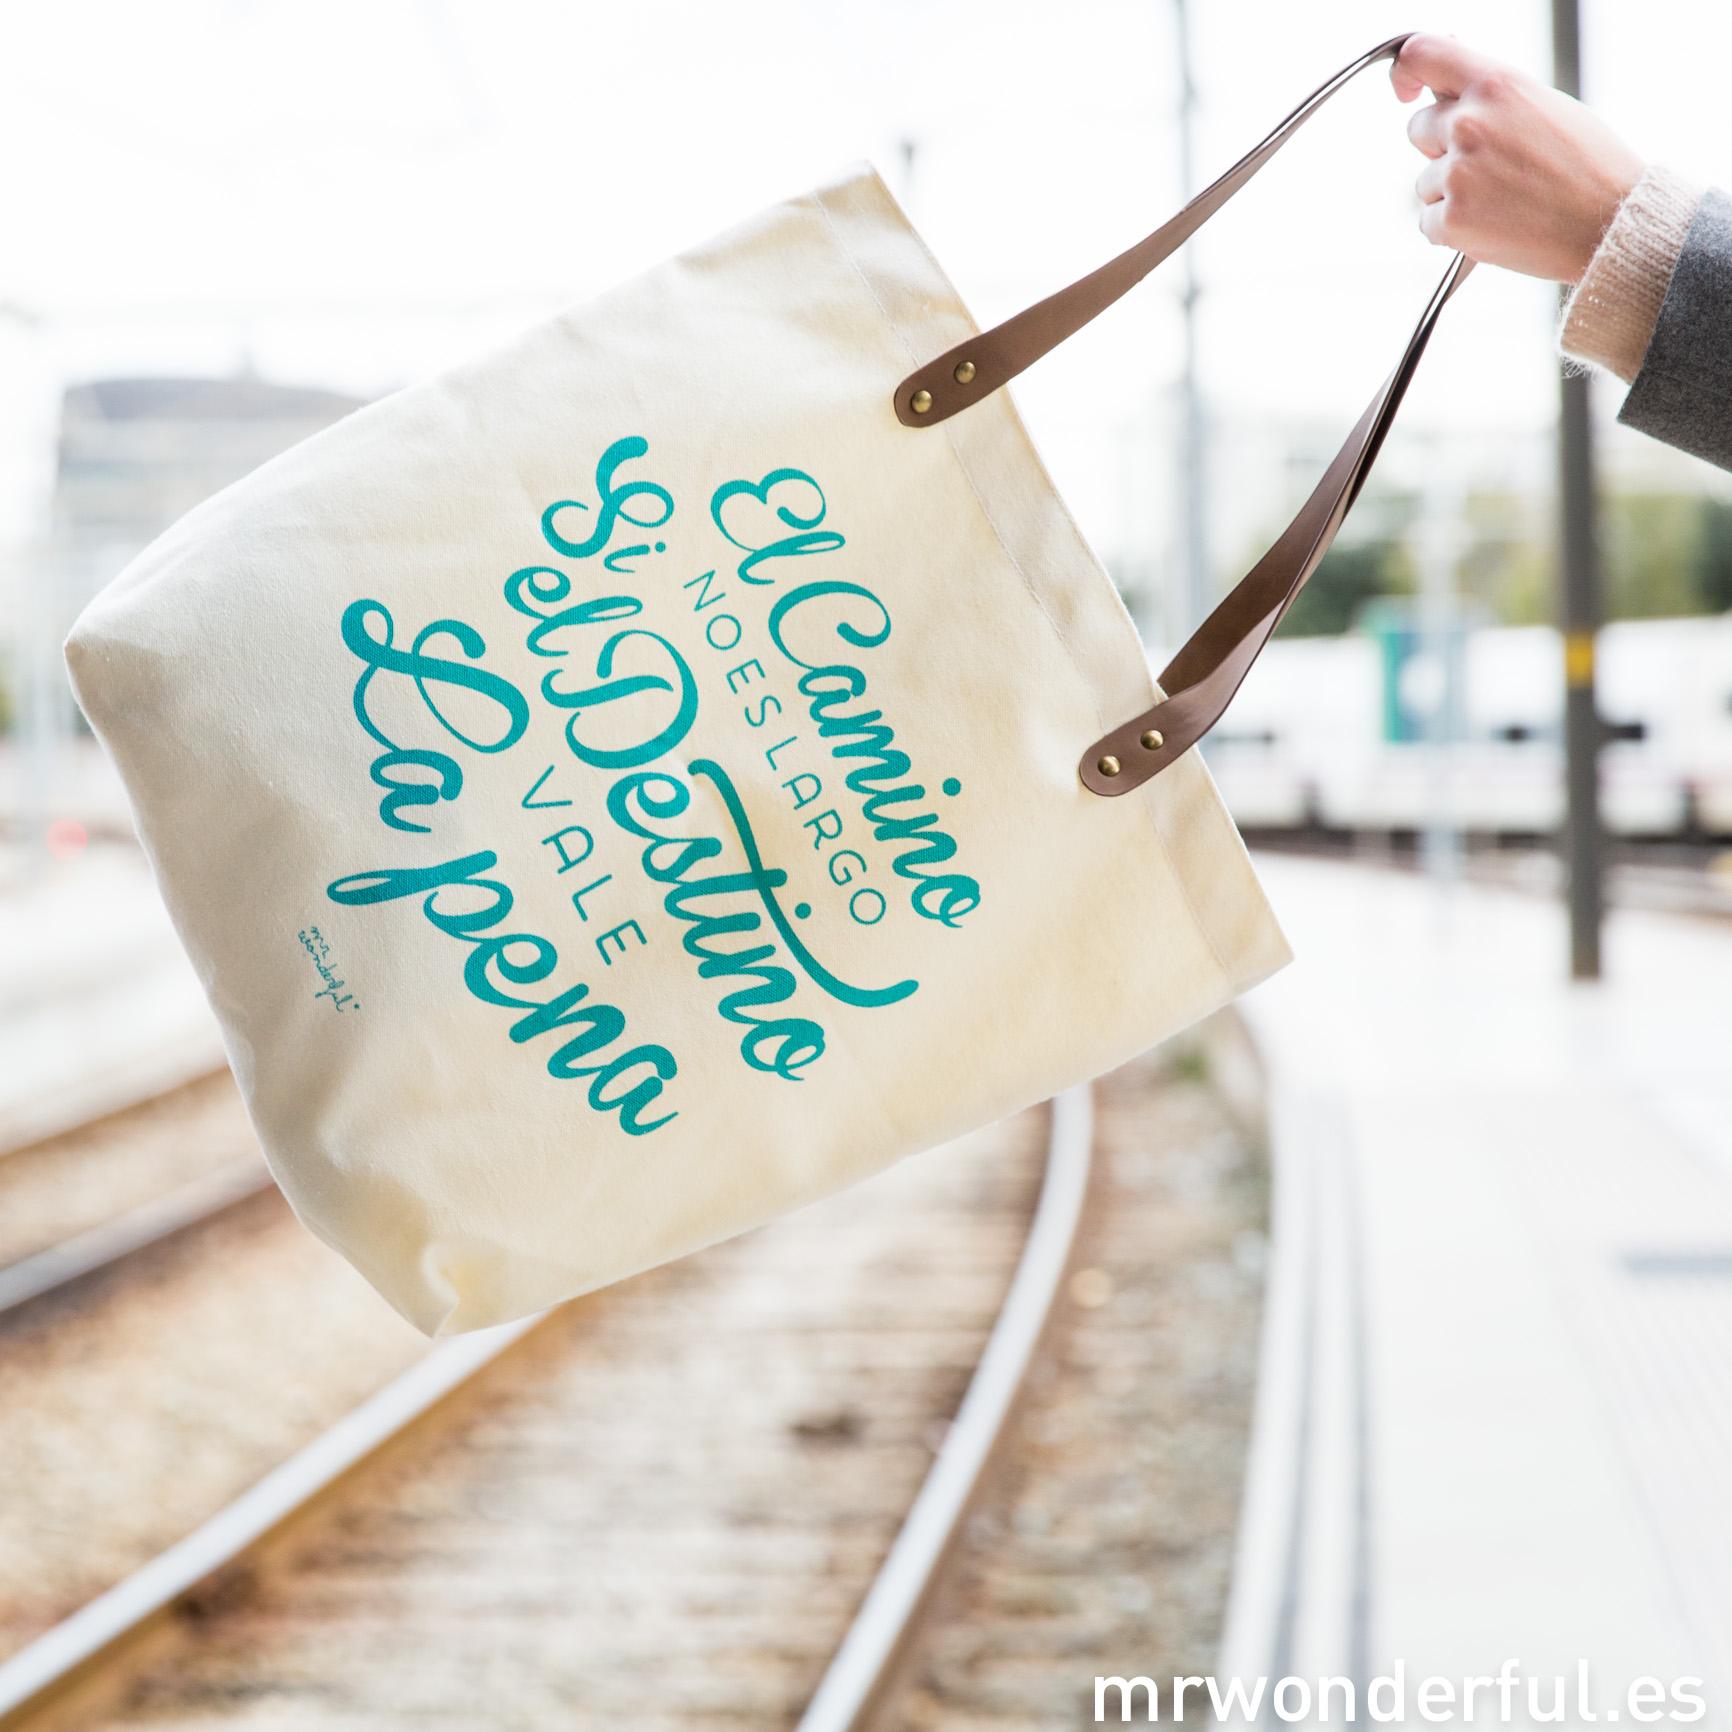 mrwonderful_tote-bags-2014_lifestyle-134-Editar